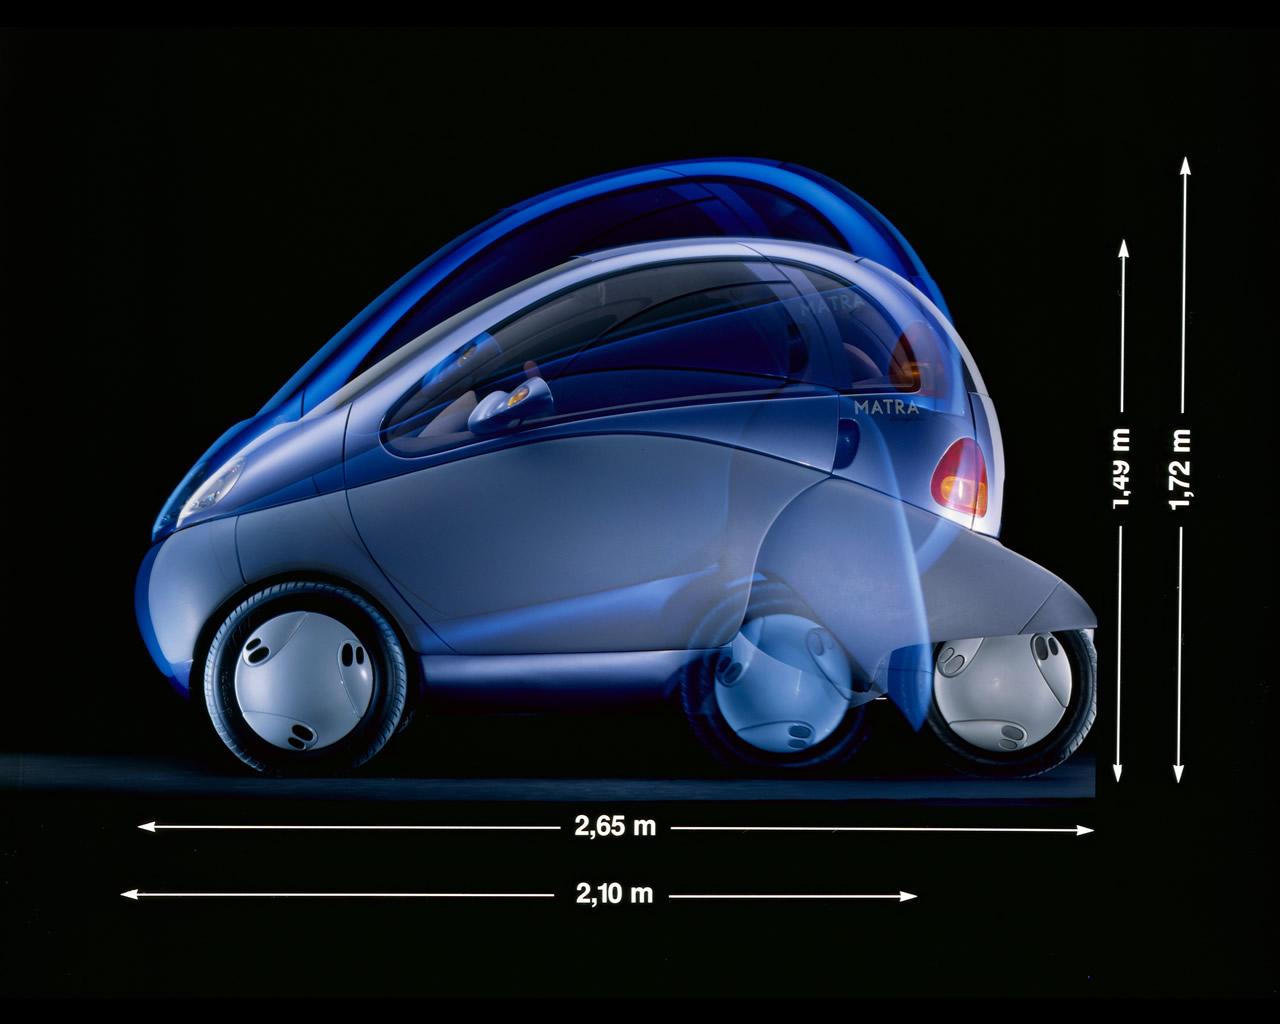 Photo Wallpaper Car Sound System Renault Zoom Electric City Car Concept 1992